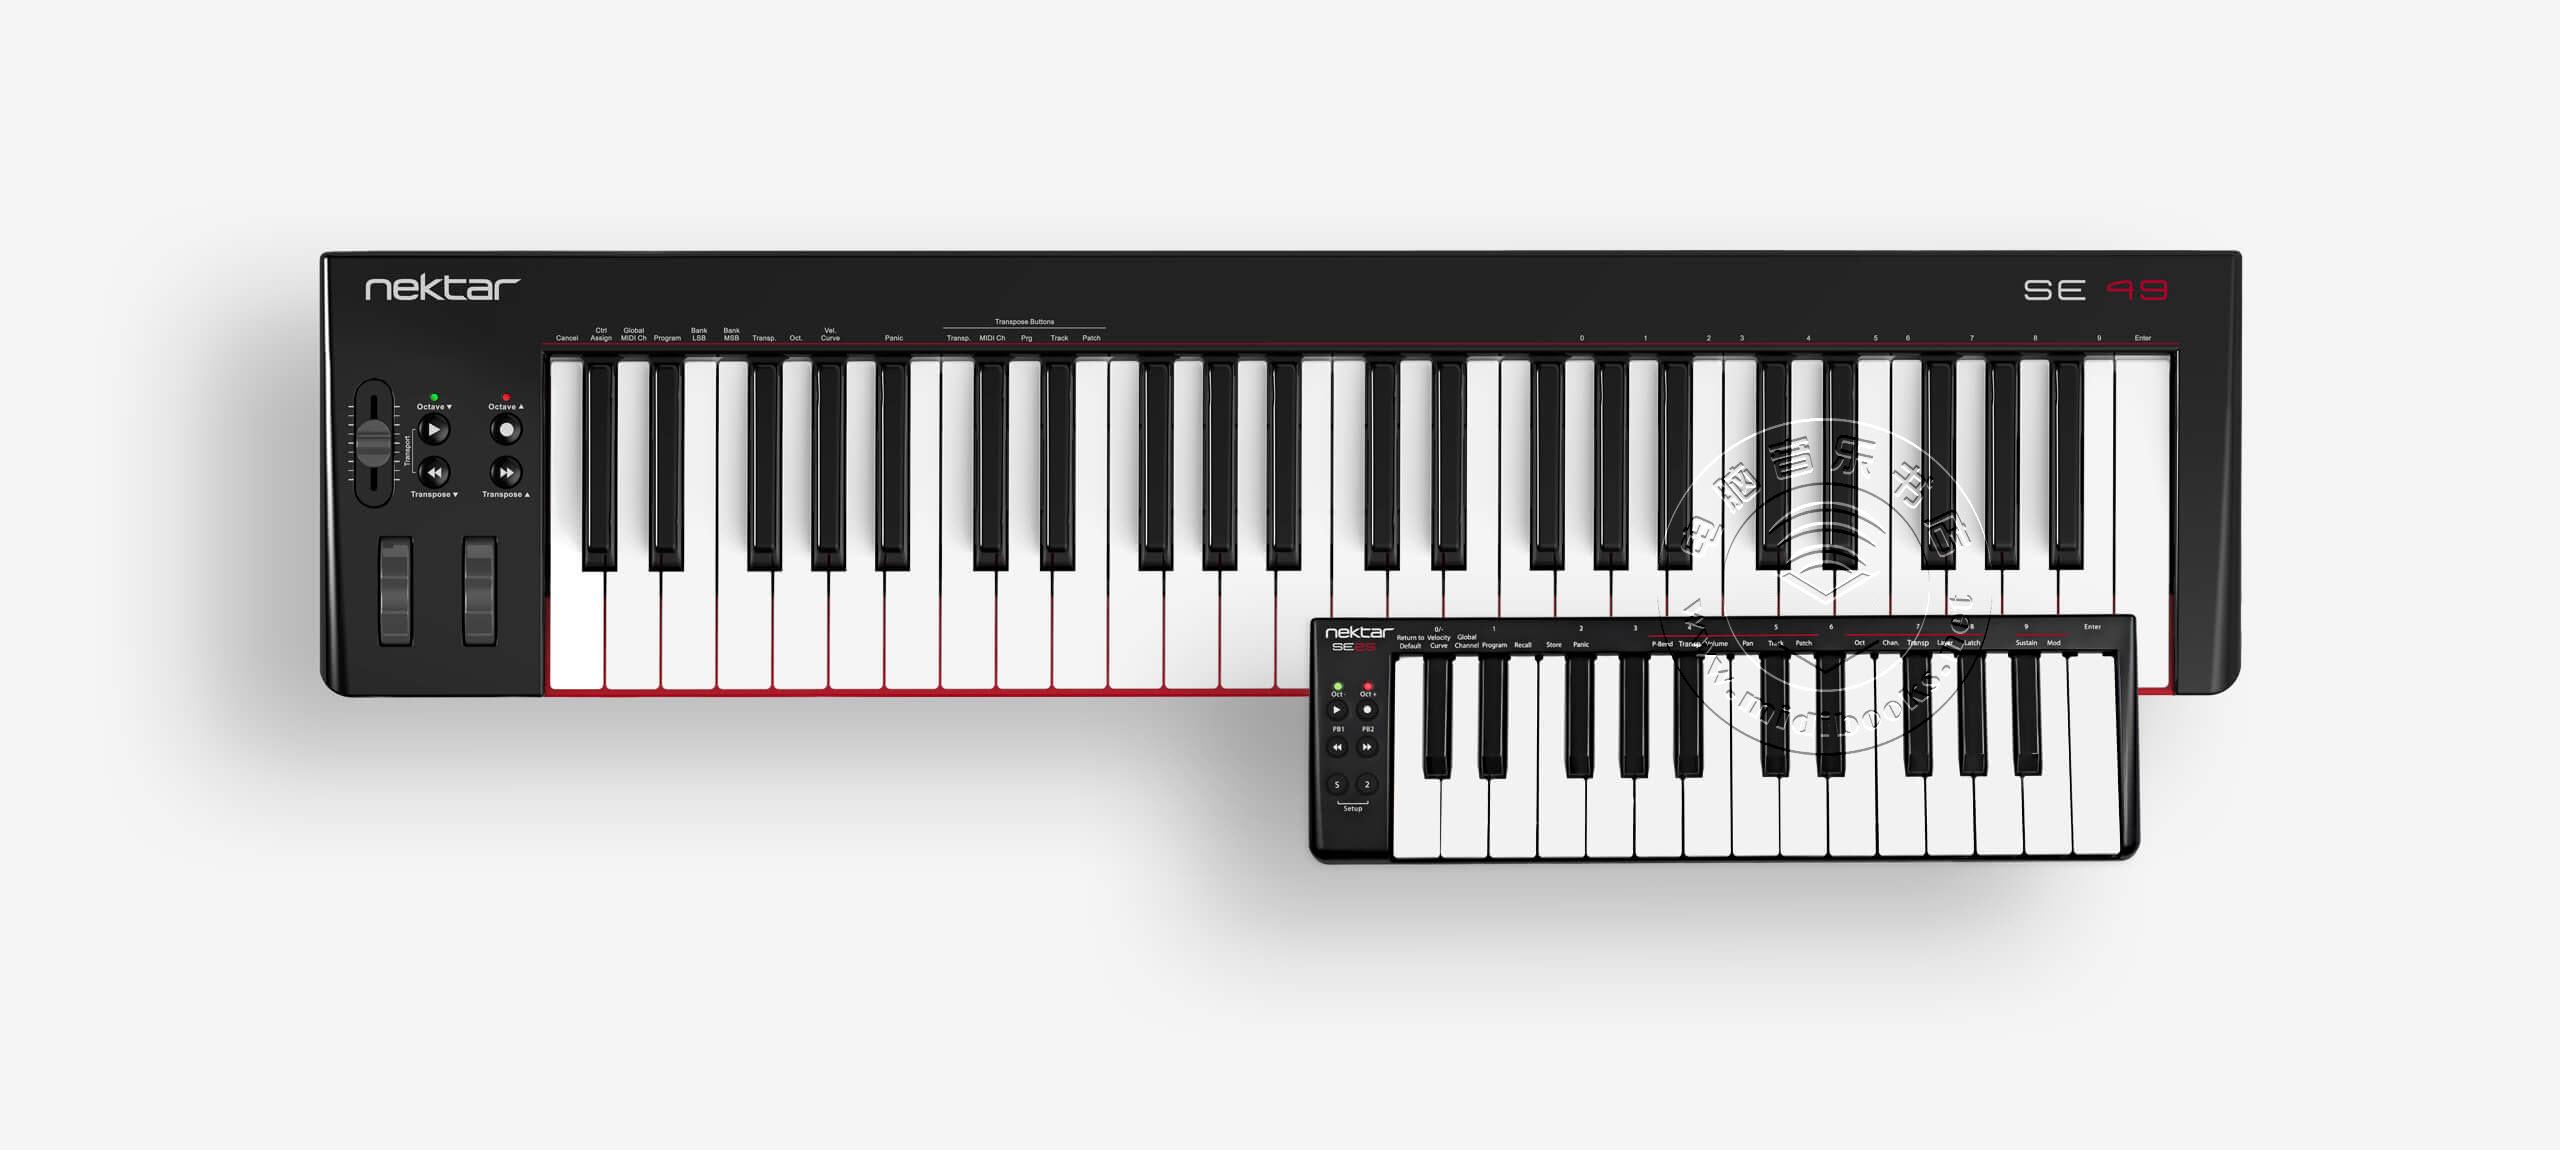 Nektar发布带有DAW集成的SE系列MIDI键盘控制器SE25和SE49(视频)